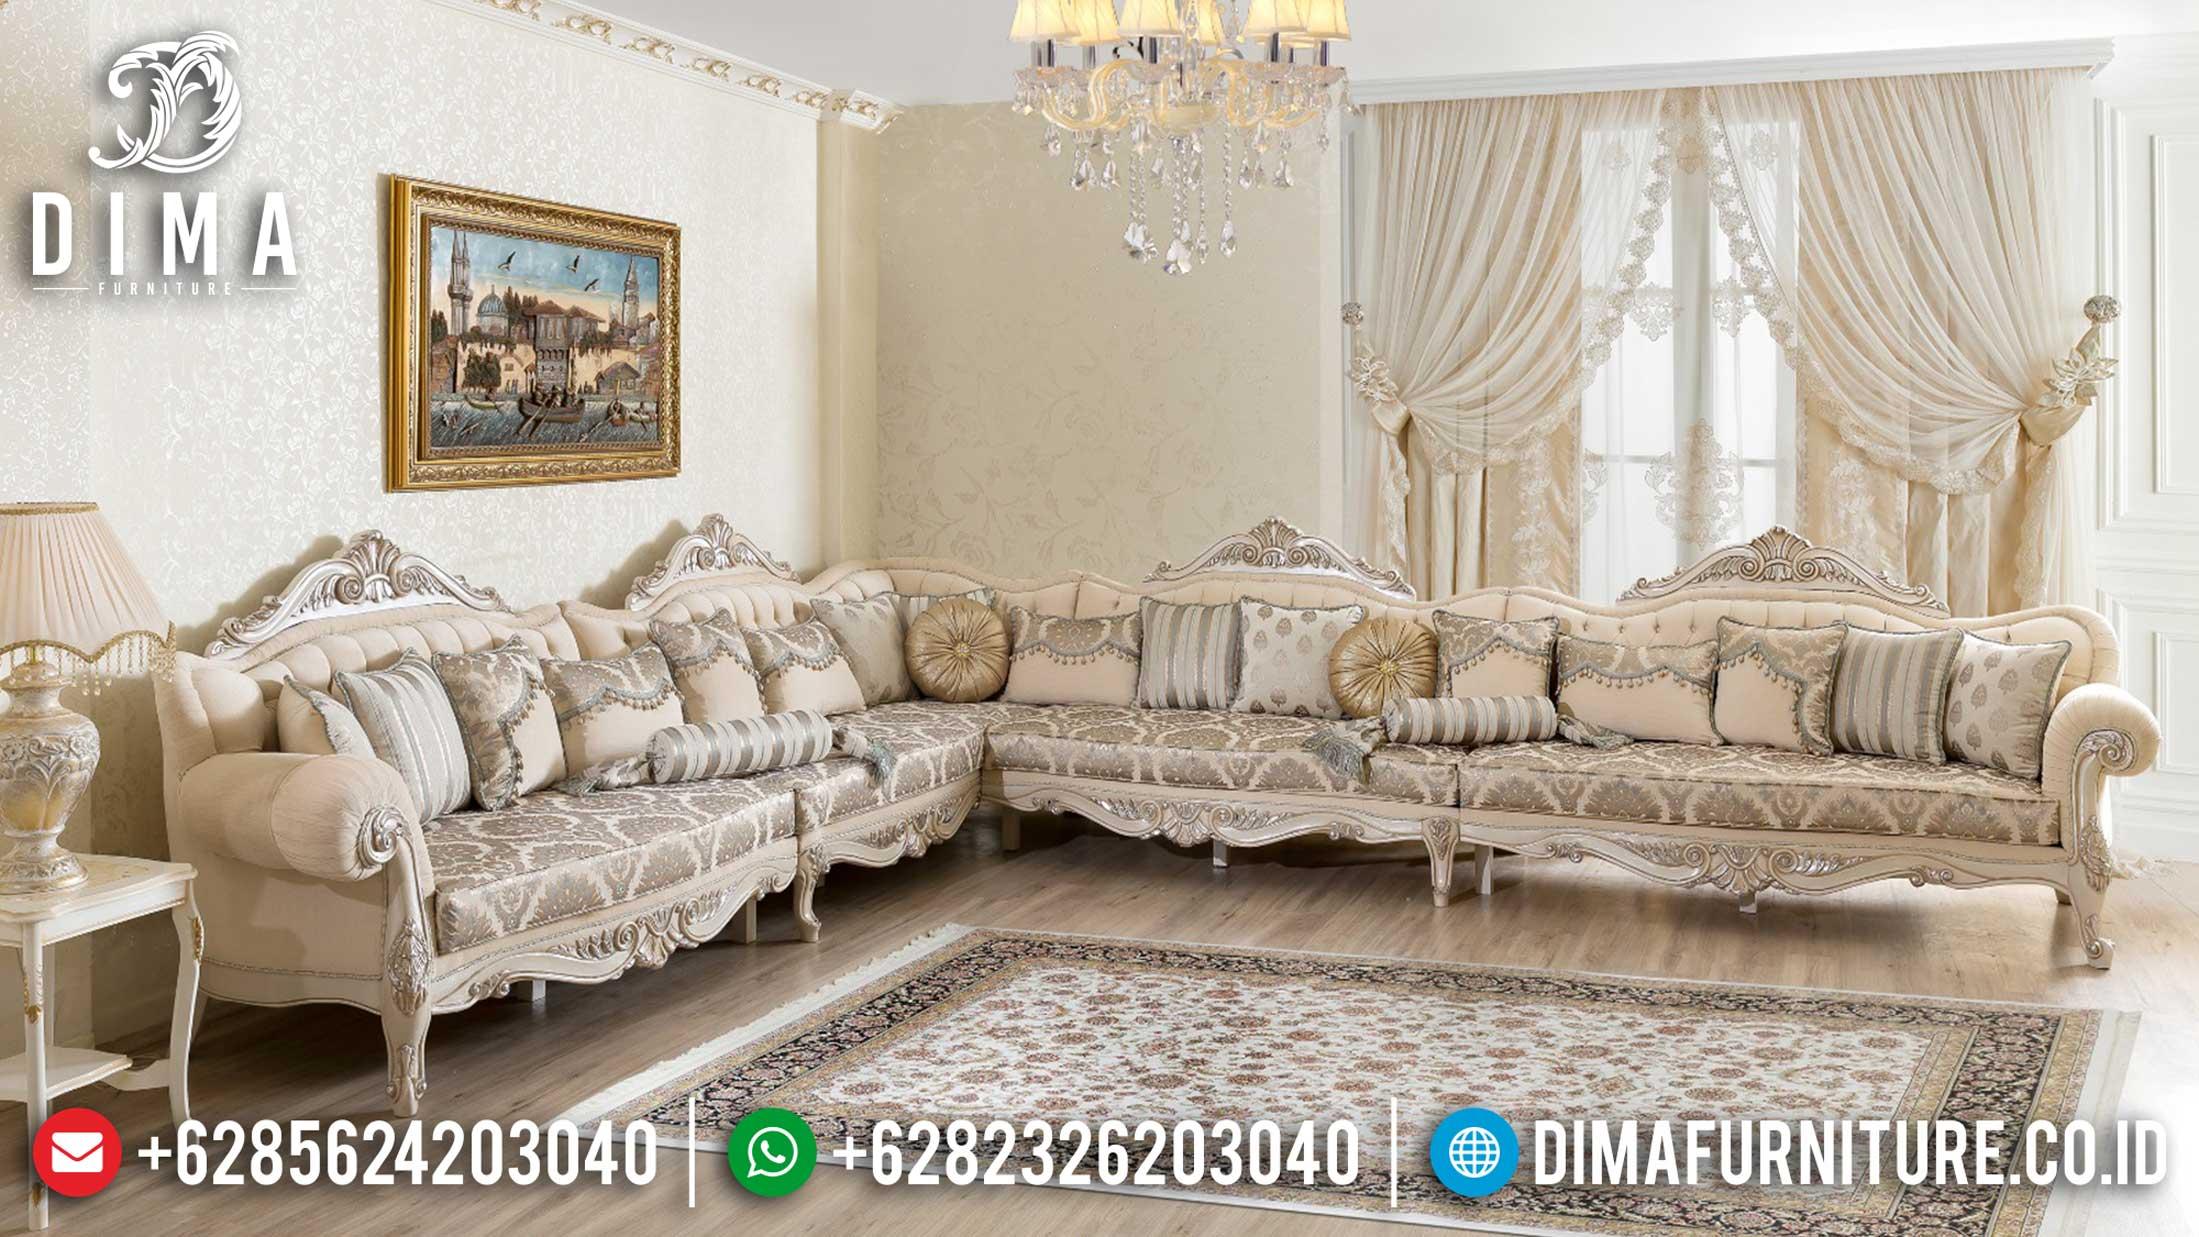 Harga Sofa Tamu Sudut Mewah Jepara Luxury Carving Elegant Design TTJ-1210